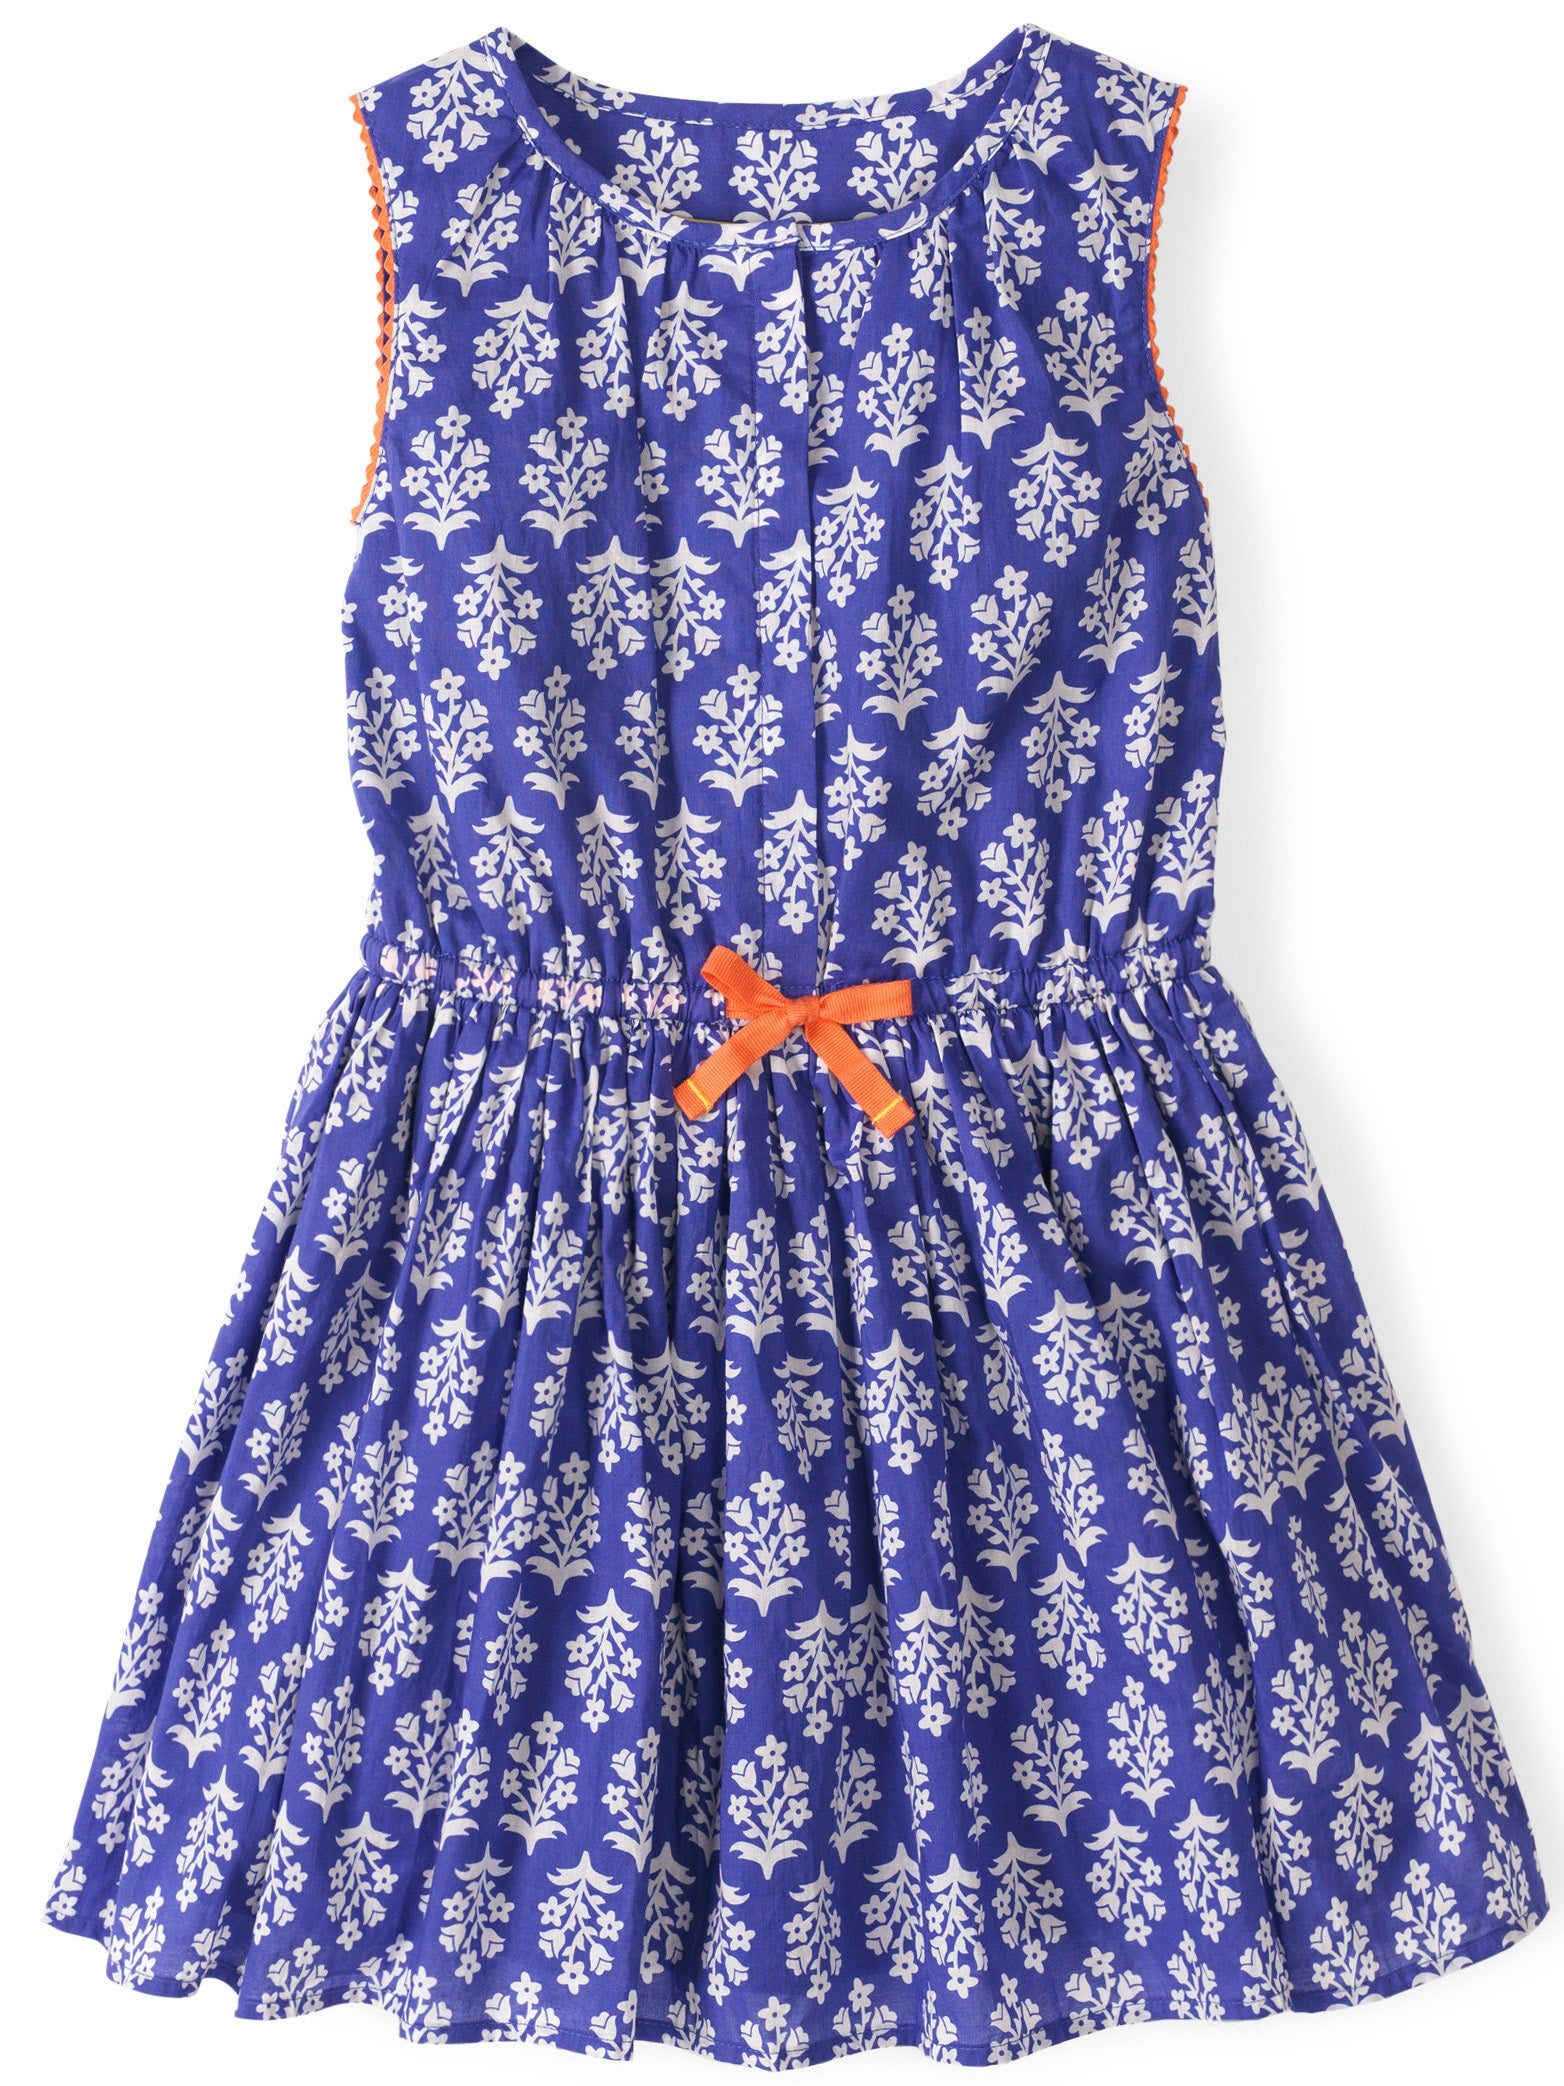 14 Best Girls Summer Dresses The Independent